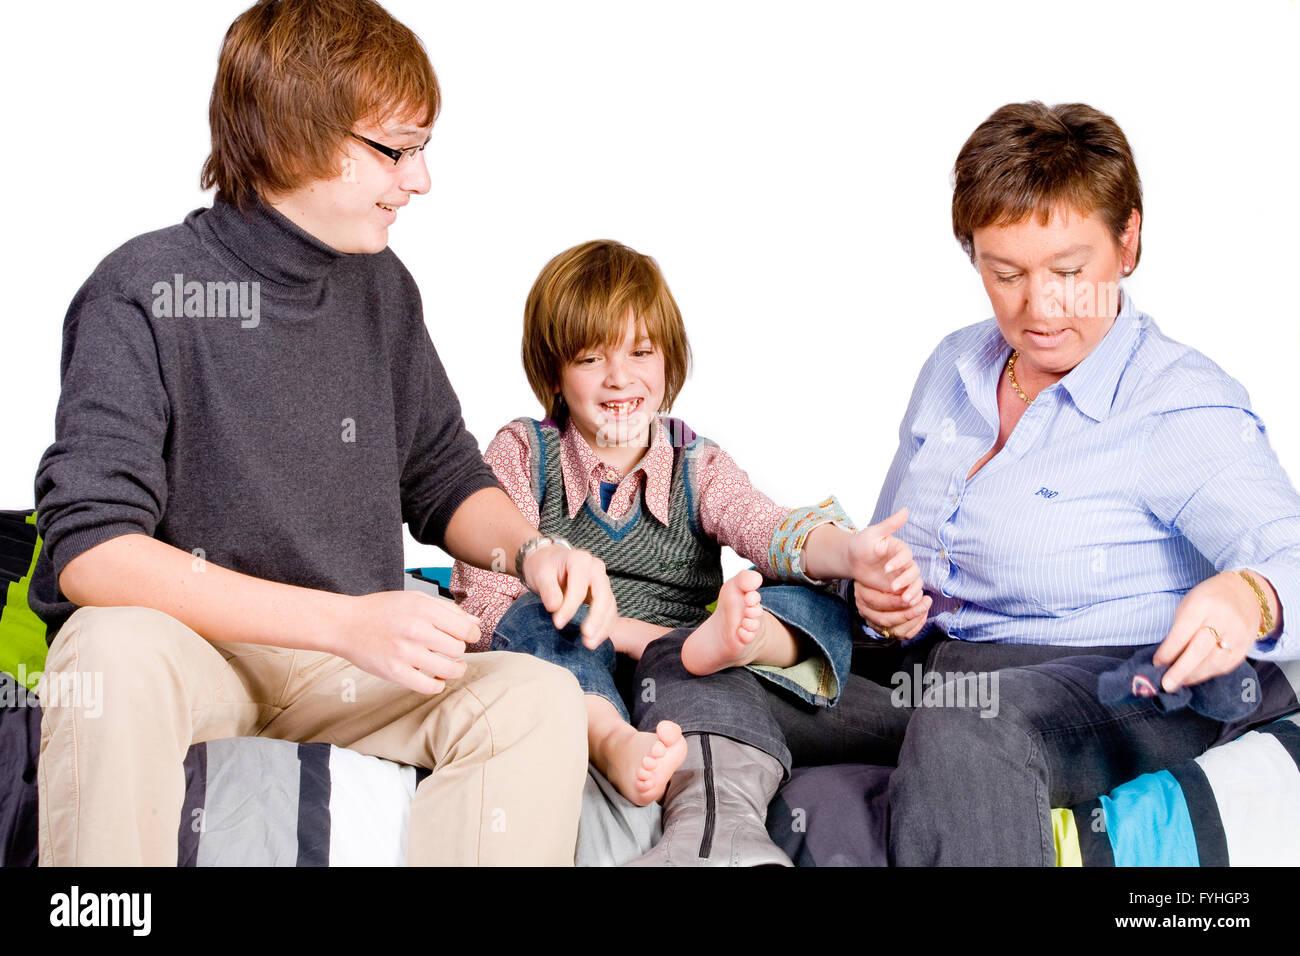 Tickling Stockfotos & Tickling Bilder - Alamy